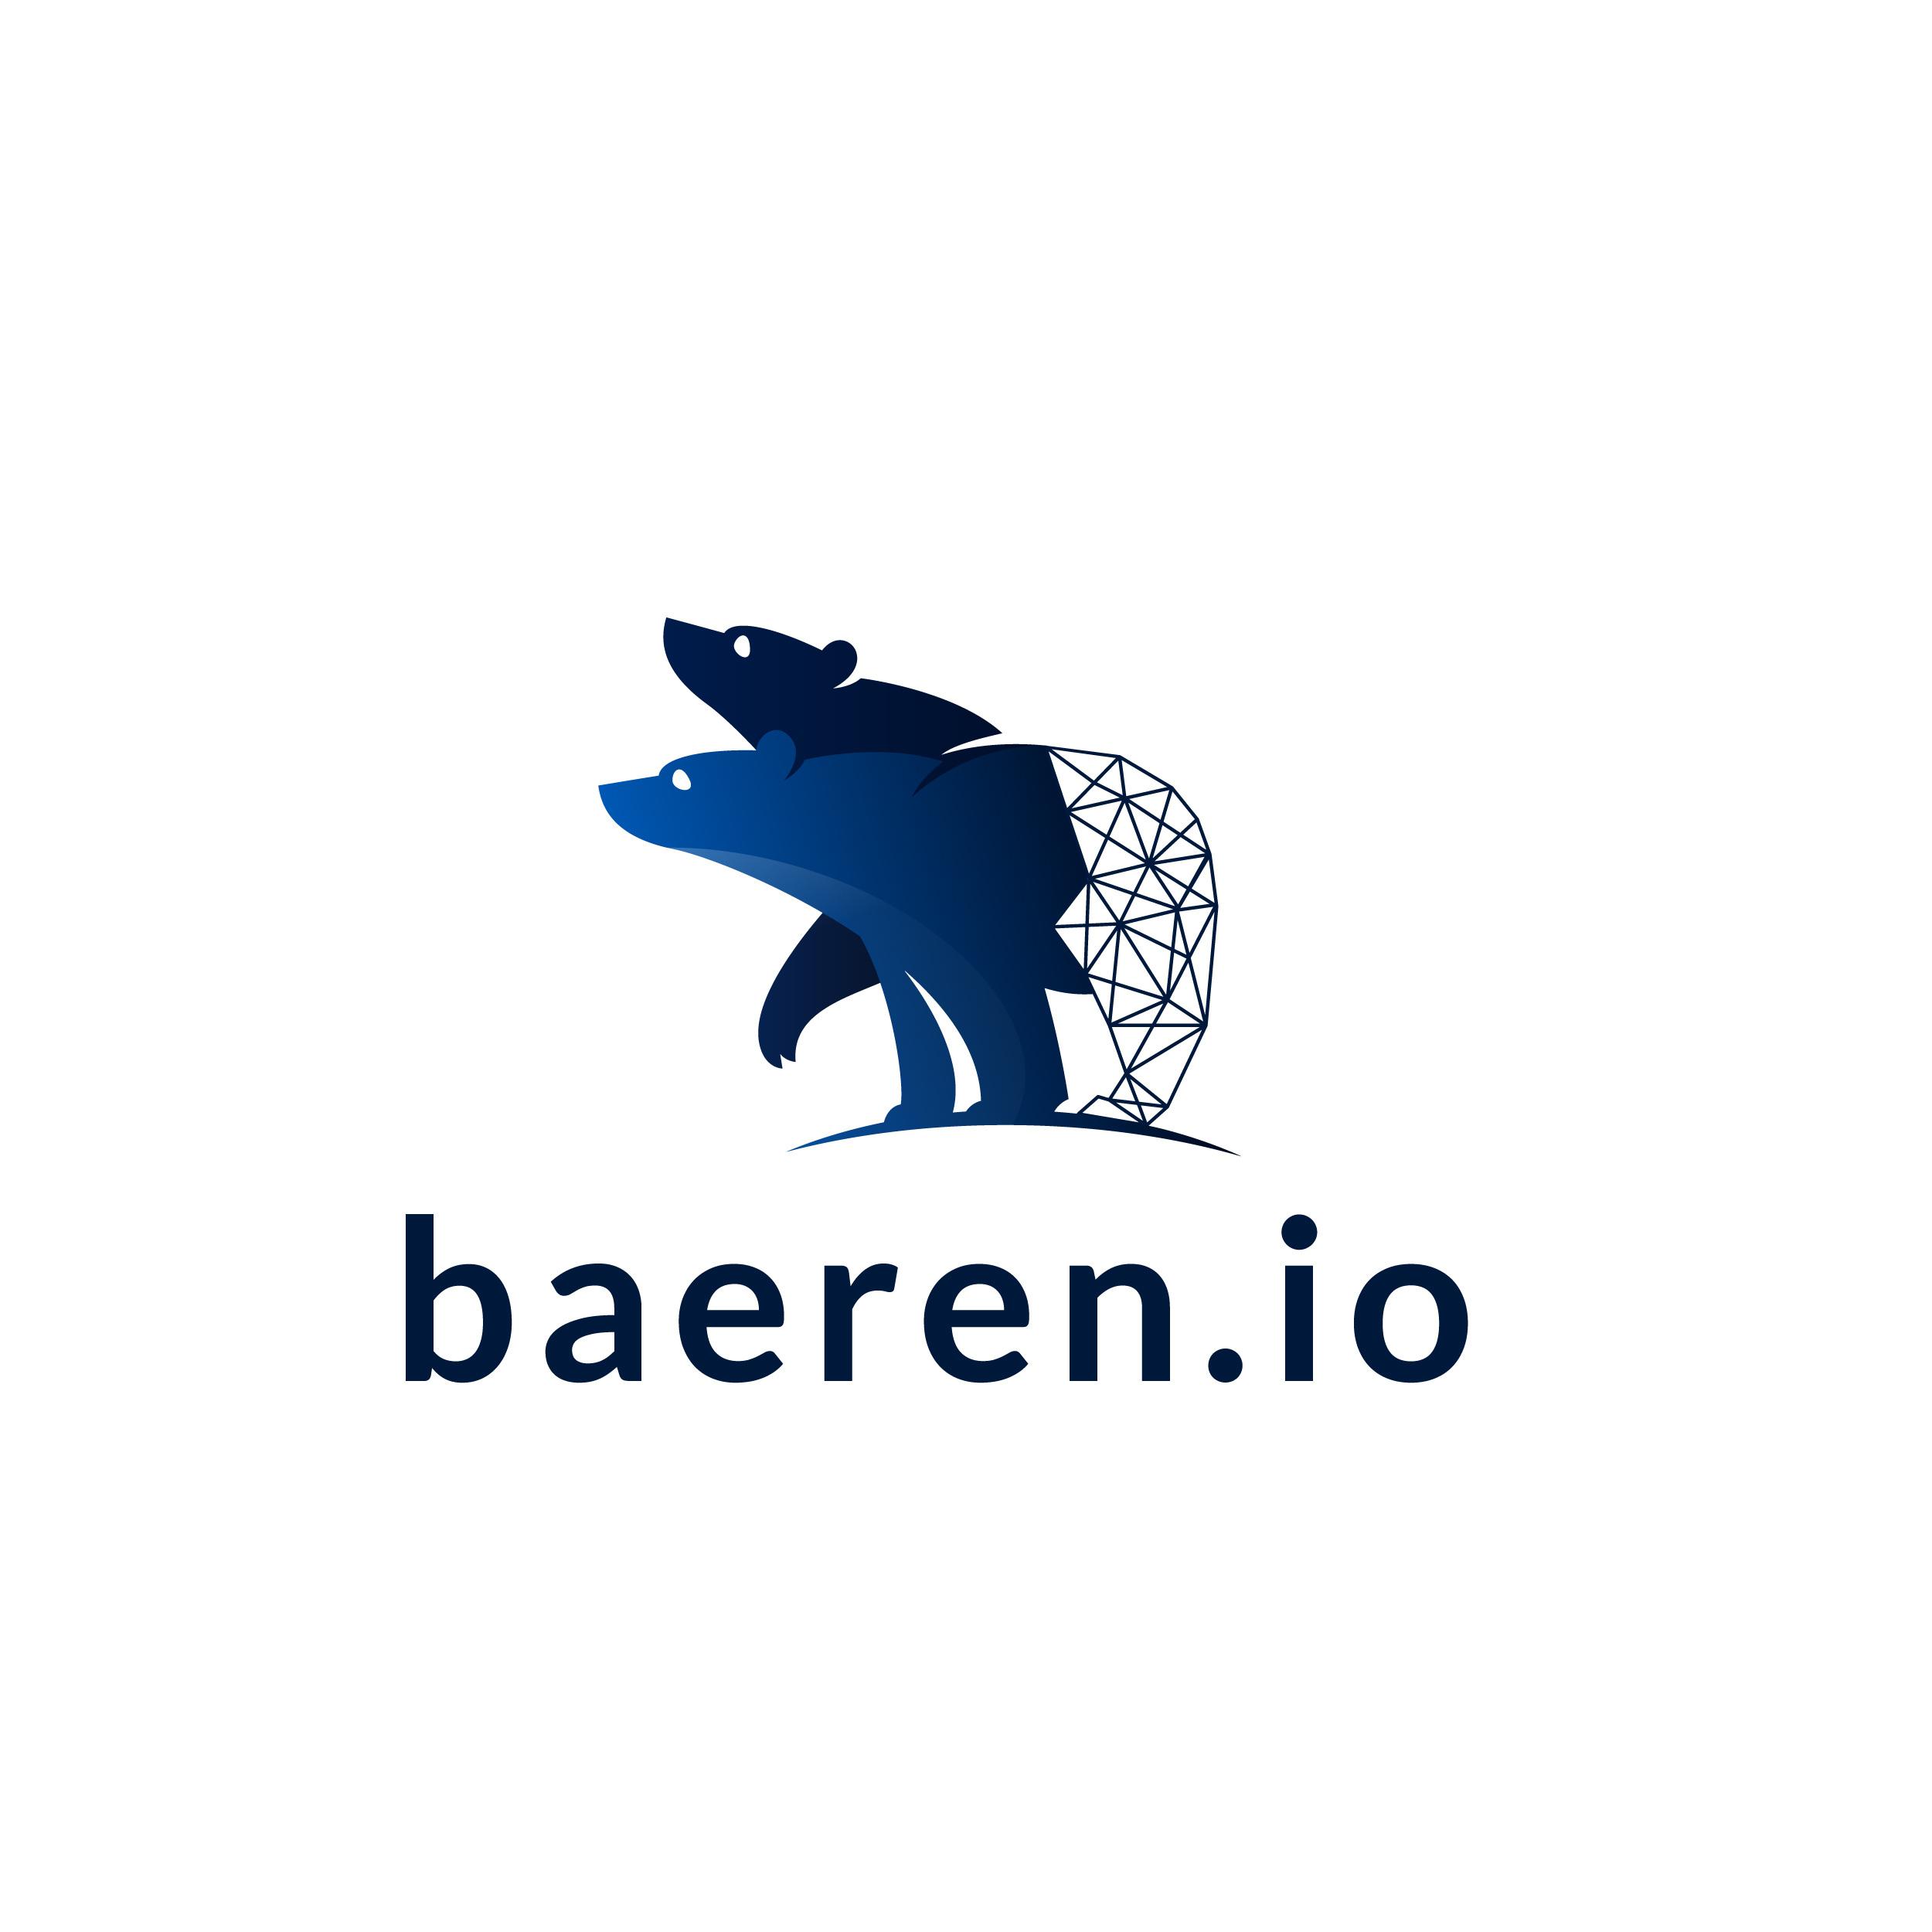 logo-baeren-LatoSchrift-01.jpg